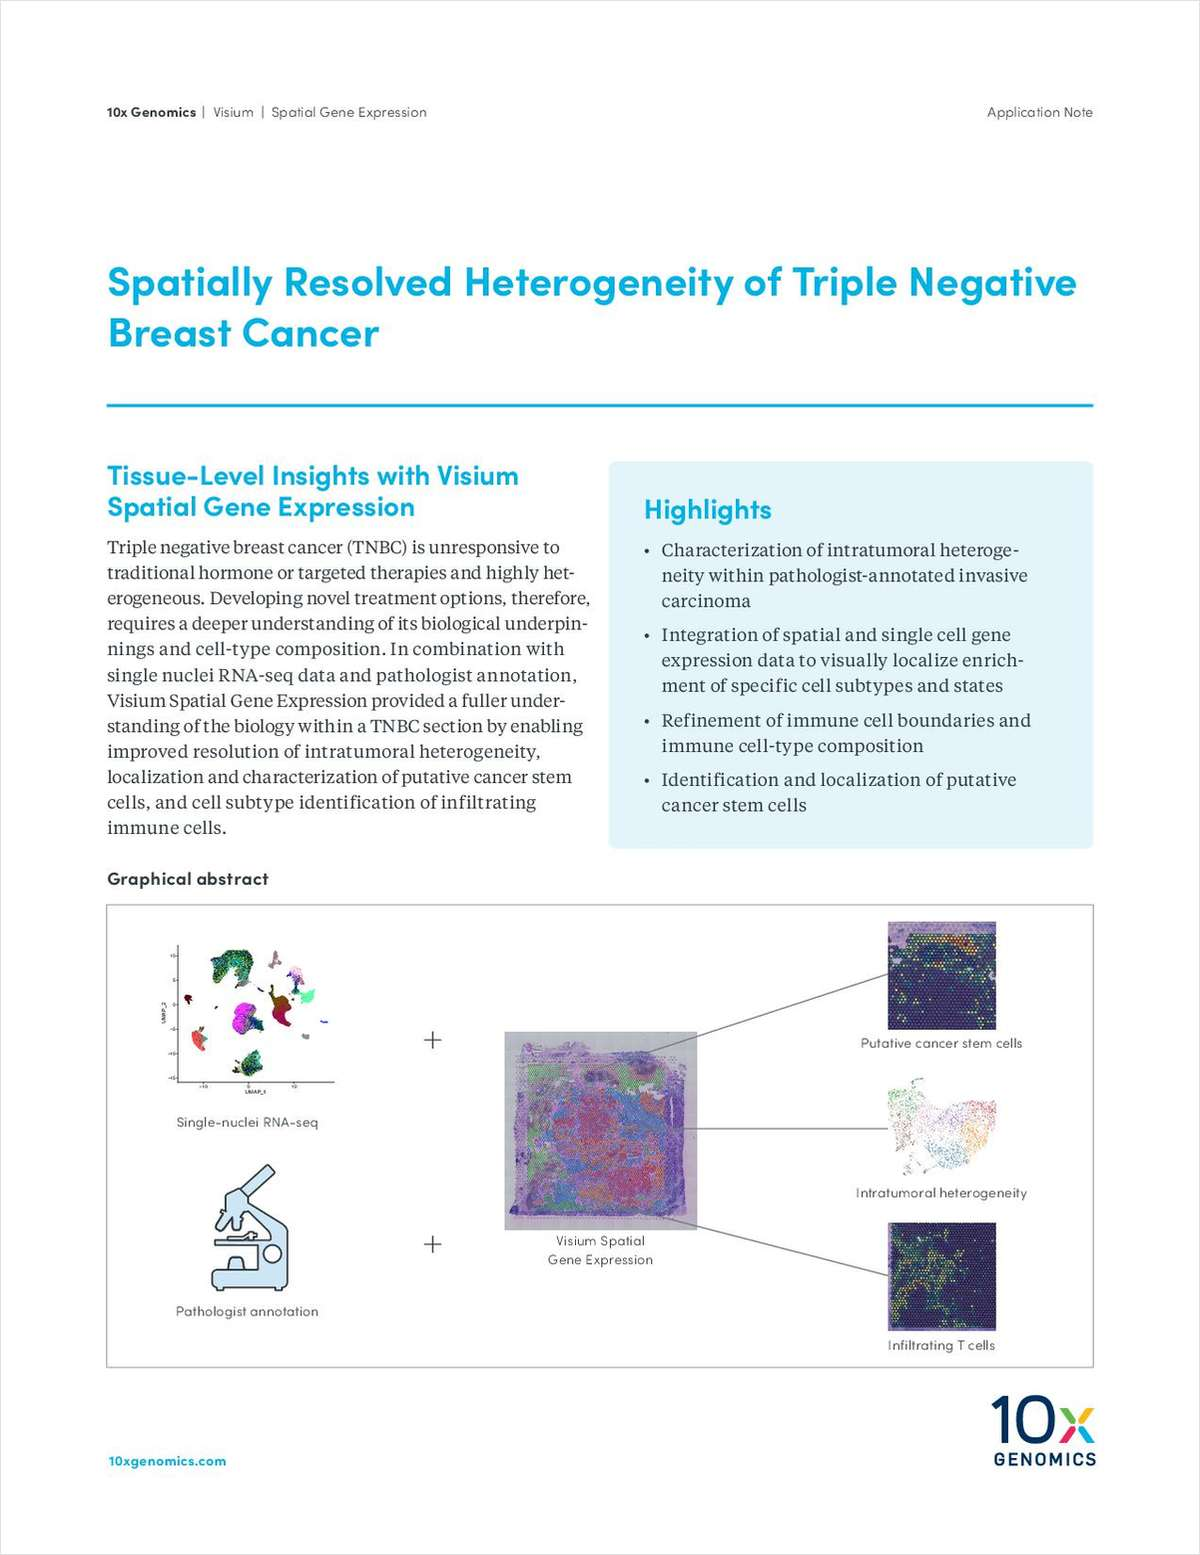 Spatially Resolved Heterogeneity of Triple Negative Breast Cancer